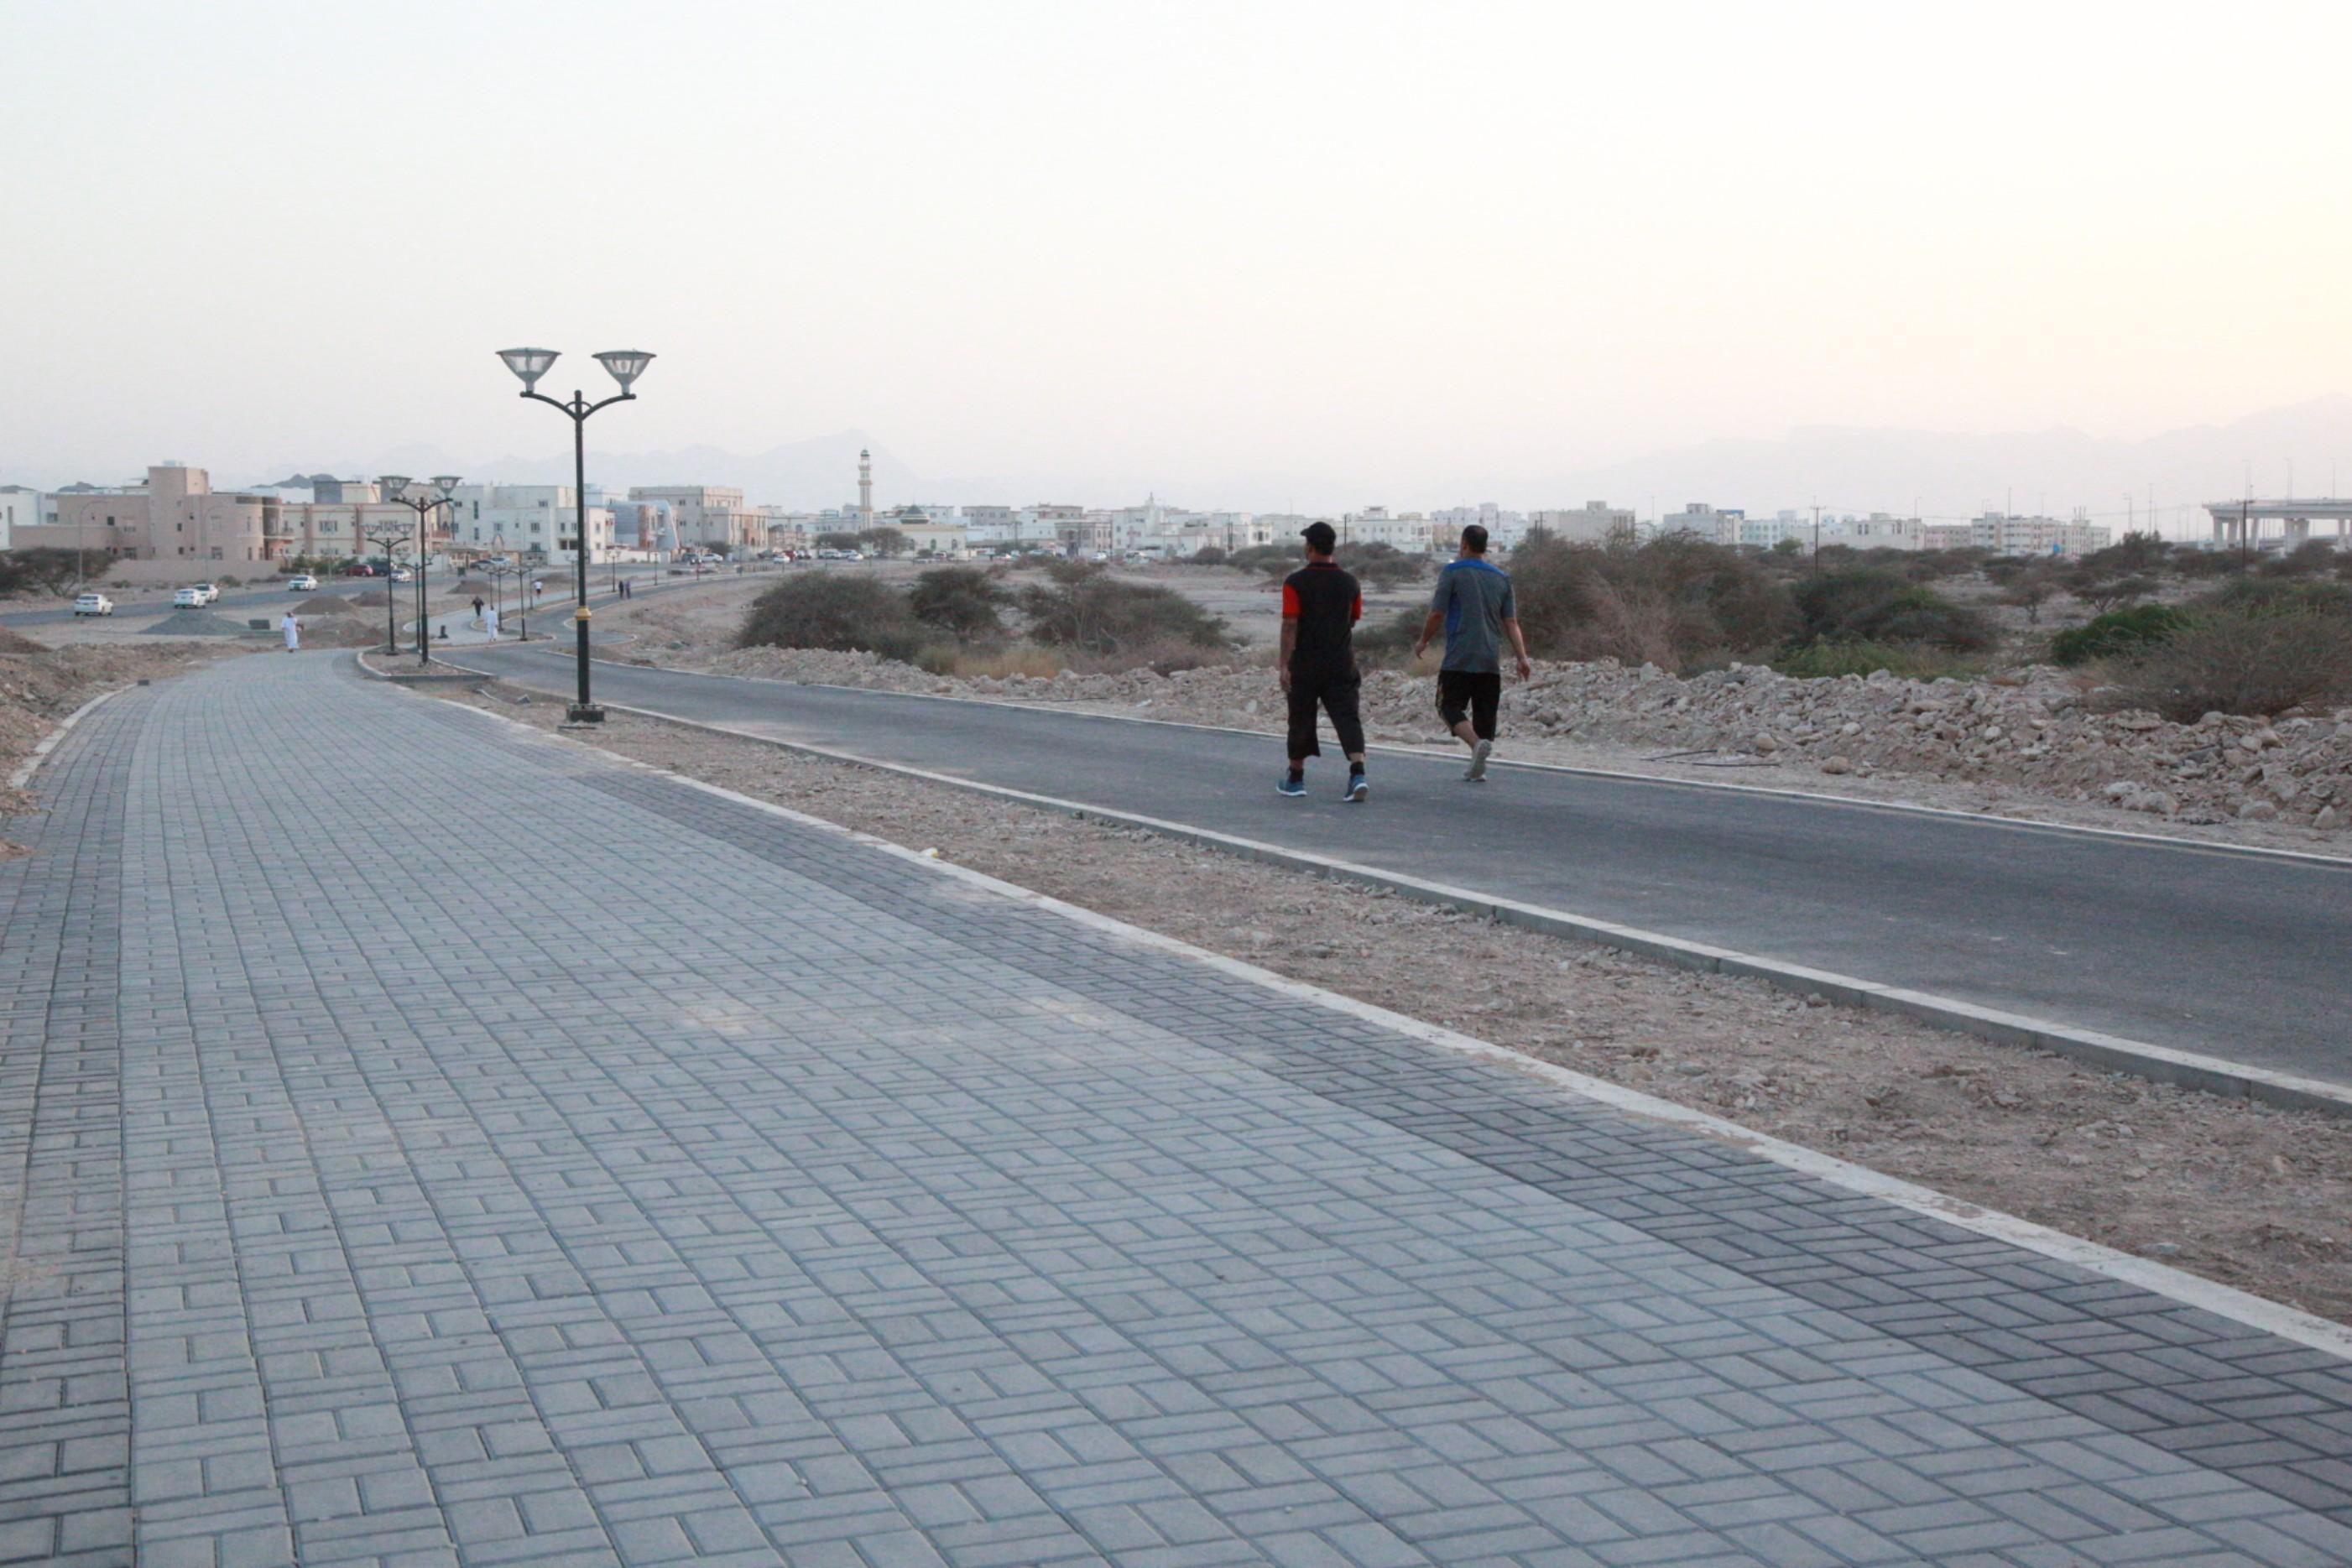 Municipality installs new pedestrian walkway, cycle lane in Muscat